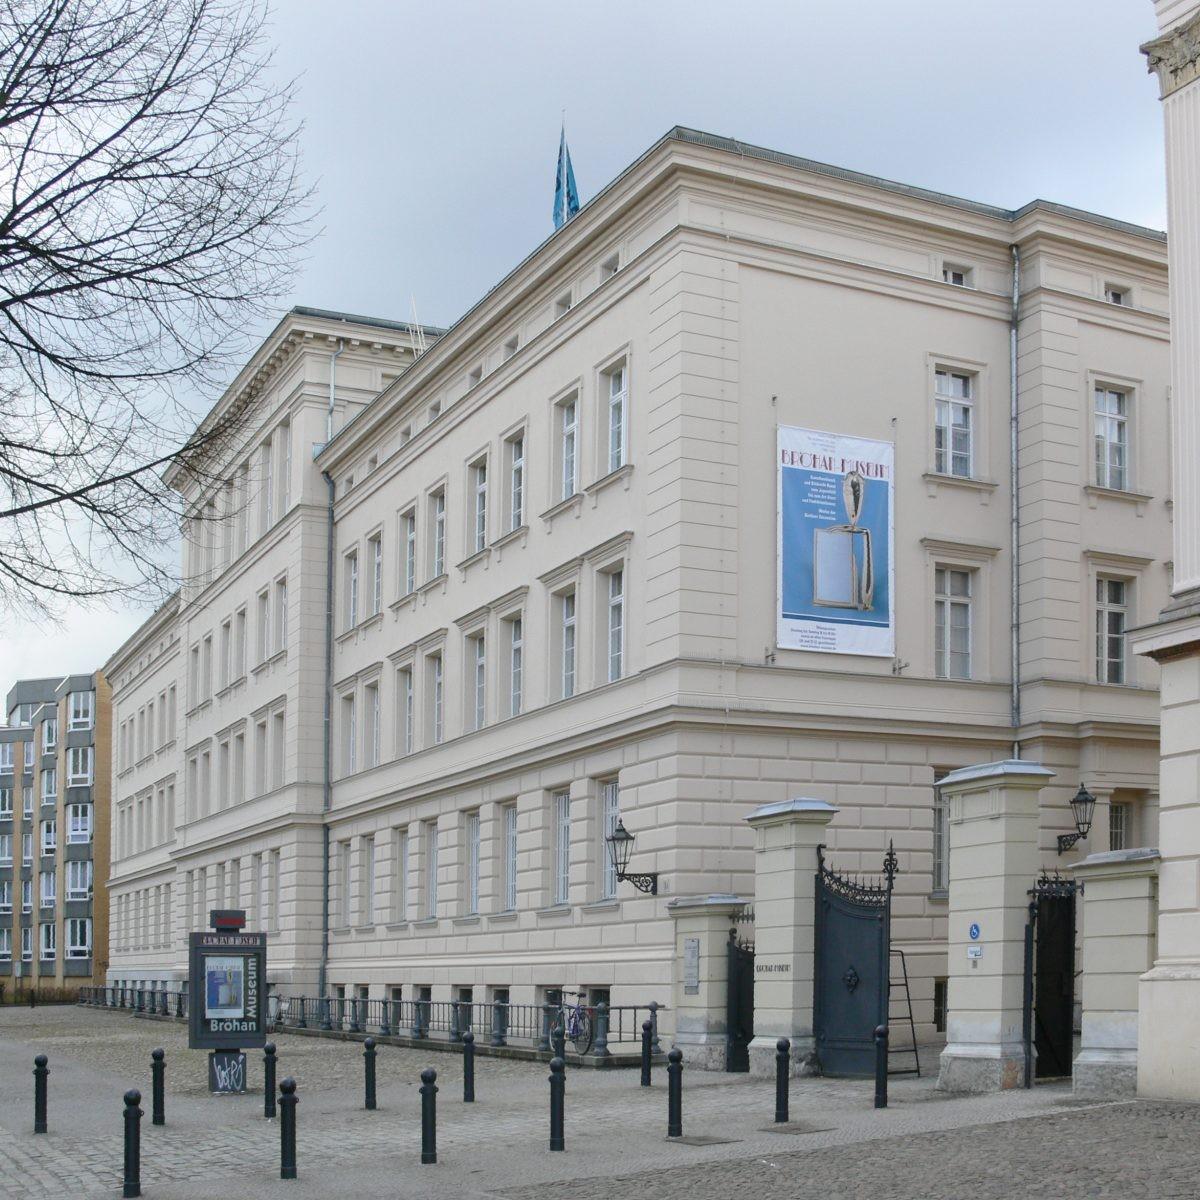 Am Schloss Charlottenburg gelegen: Bröhan-Museum in Berlin - Foto: Bröhan Museum